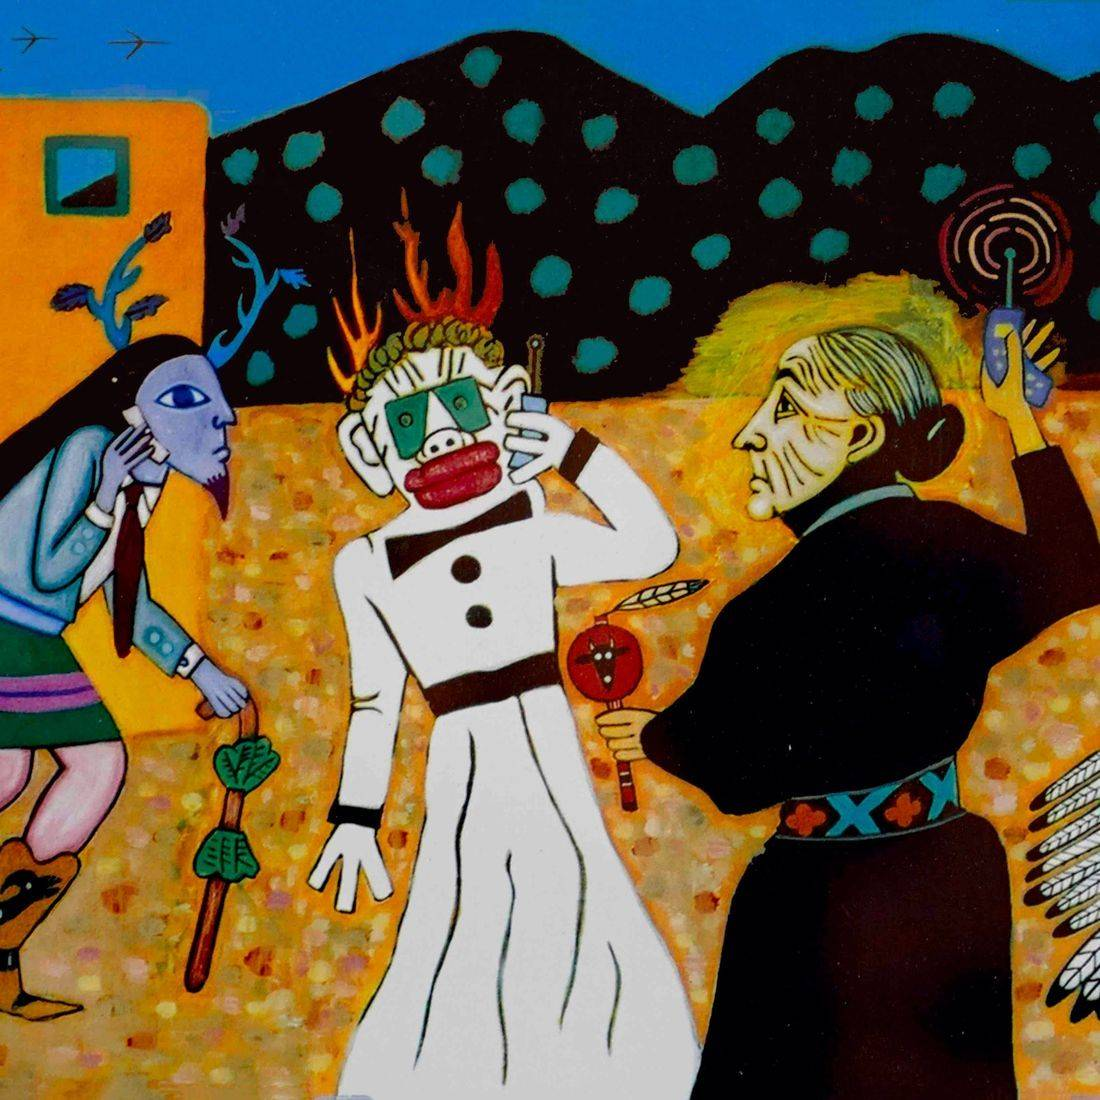 Southwest, Cellphone, Georgia O'Keeffe, Zozobra, Roswell Alien, Indian Dancer